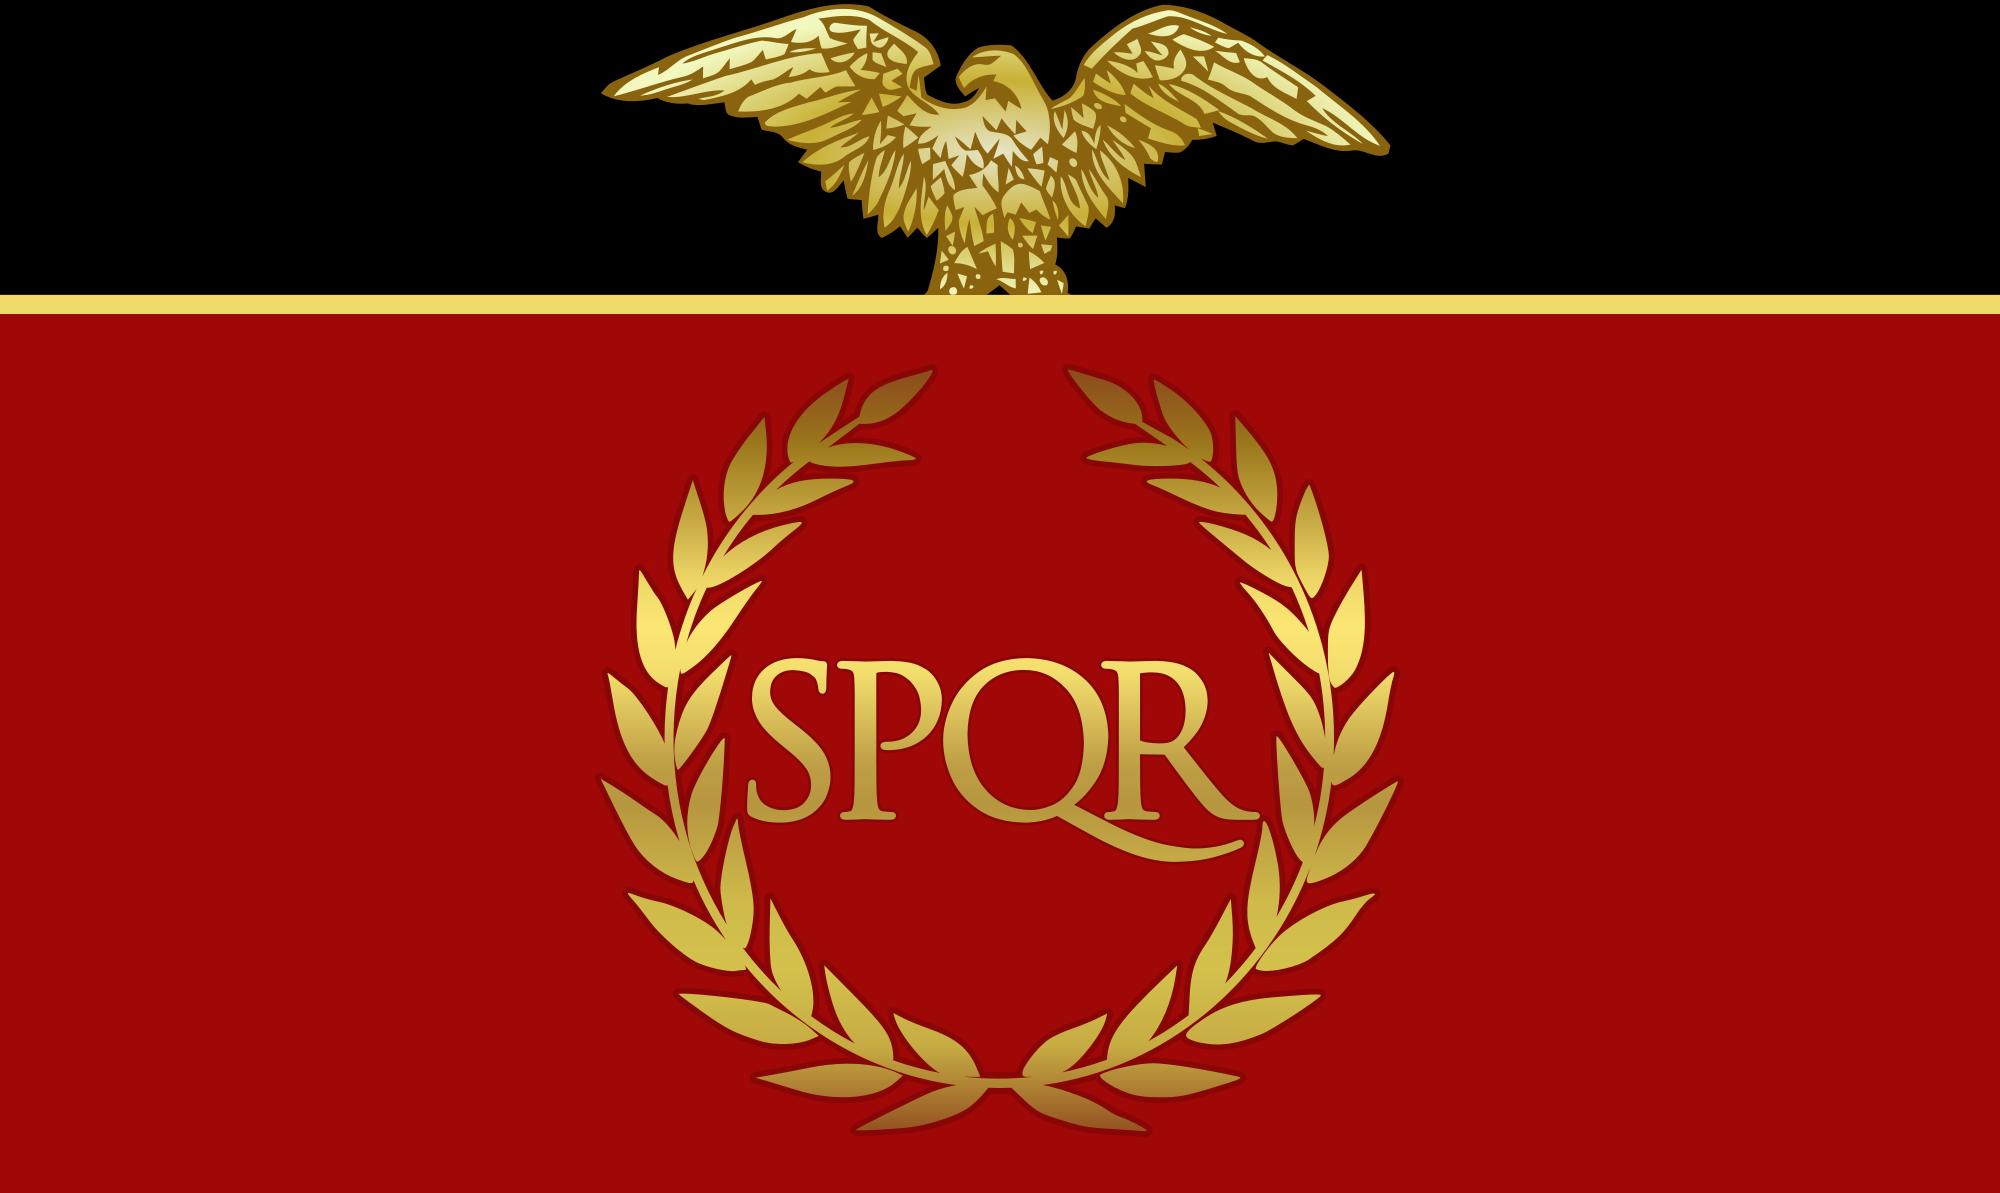 Image rome flag spqrg alternative history fandom powered rome flag spqrg biocorpaavc